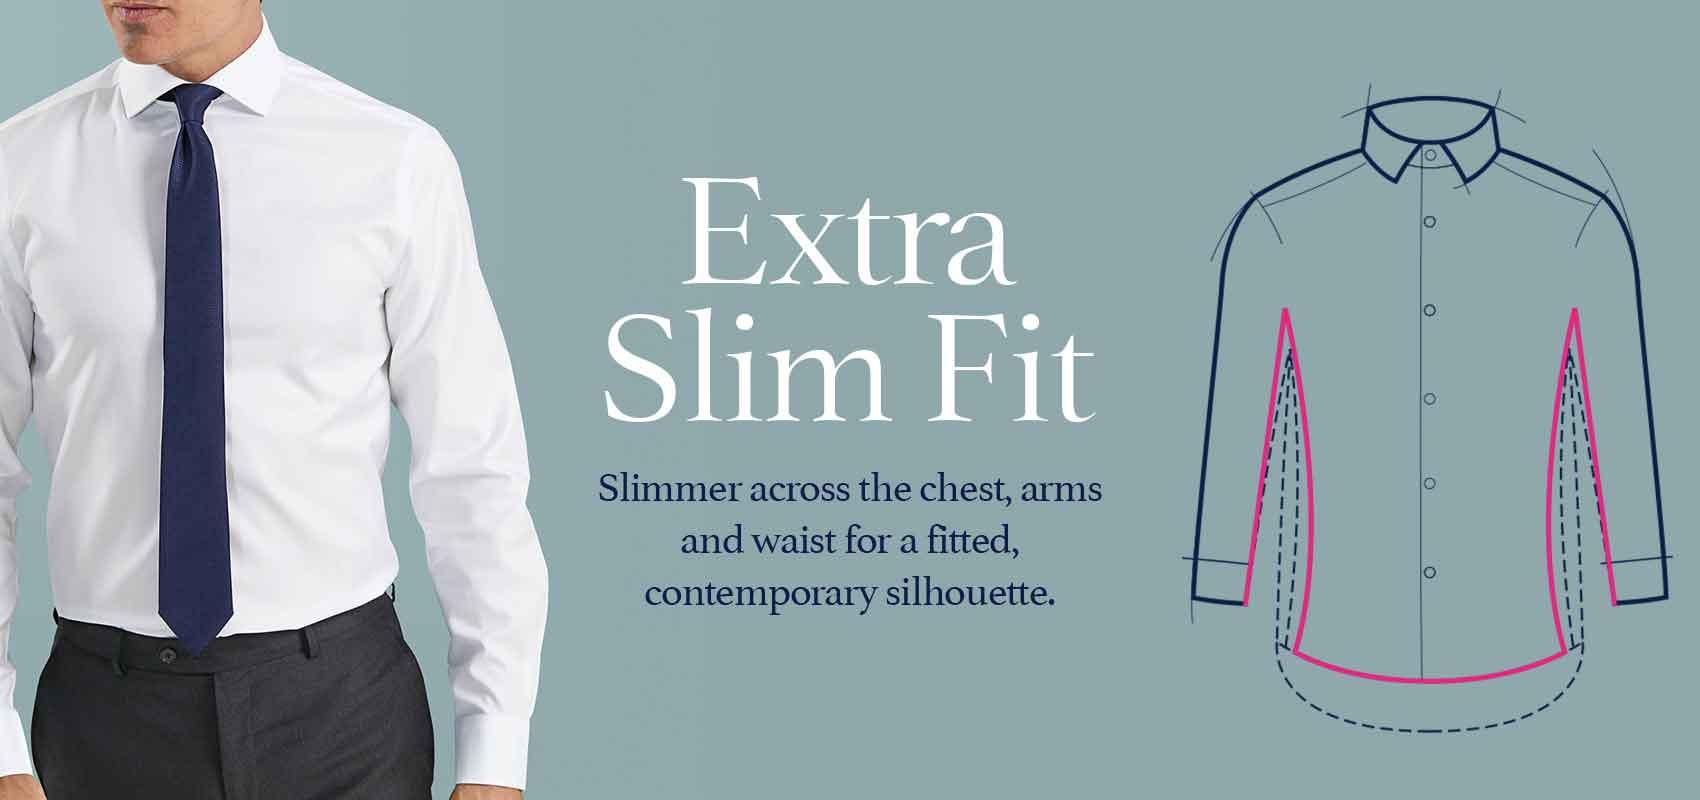 Charles Tyrwhitt extra slim fit shirts